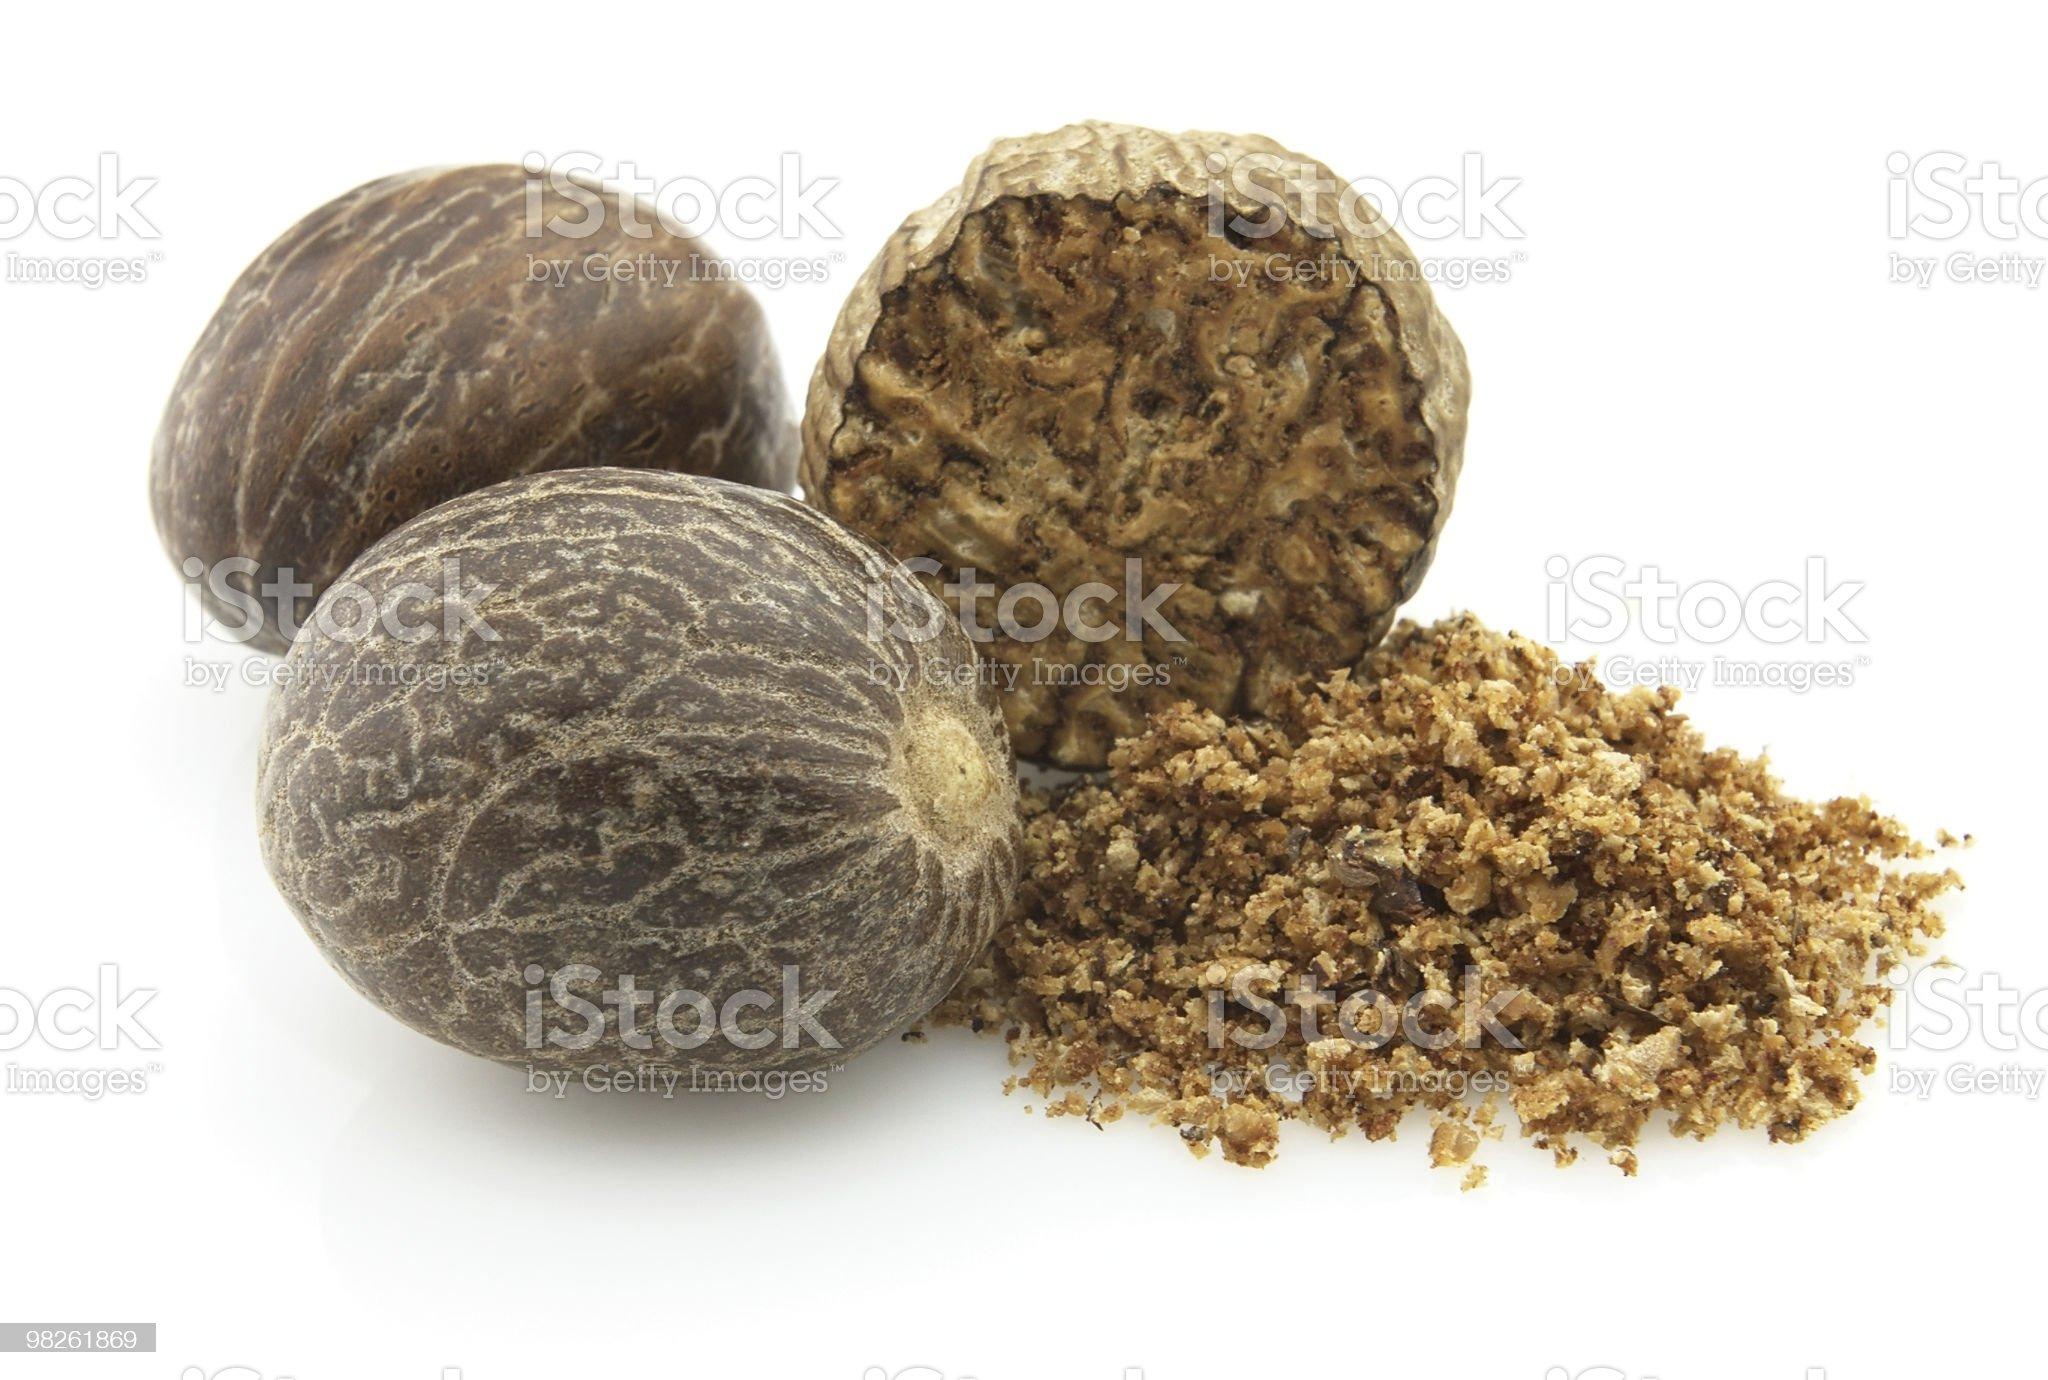 Whole and crushed up nutmeg on a white background royalty-free stock photo